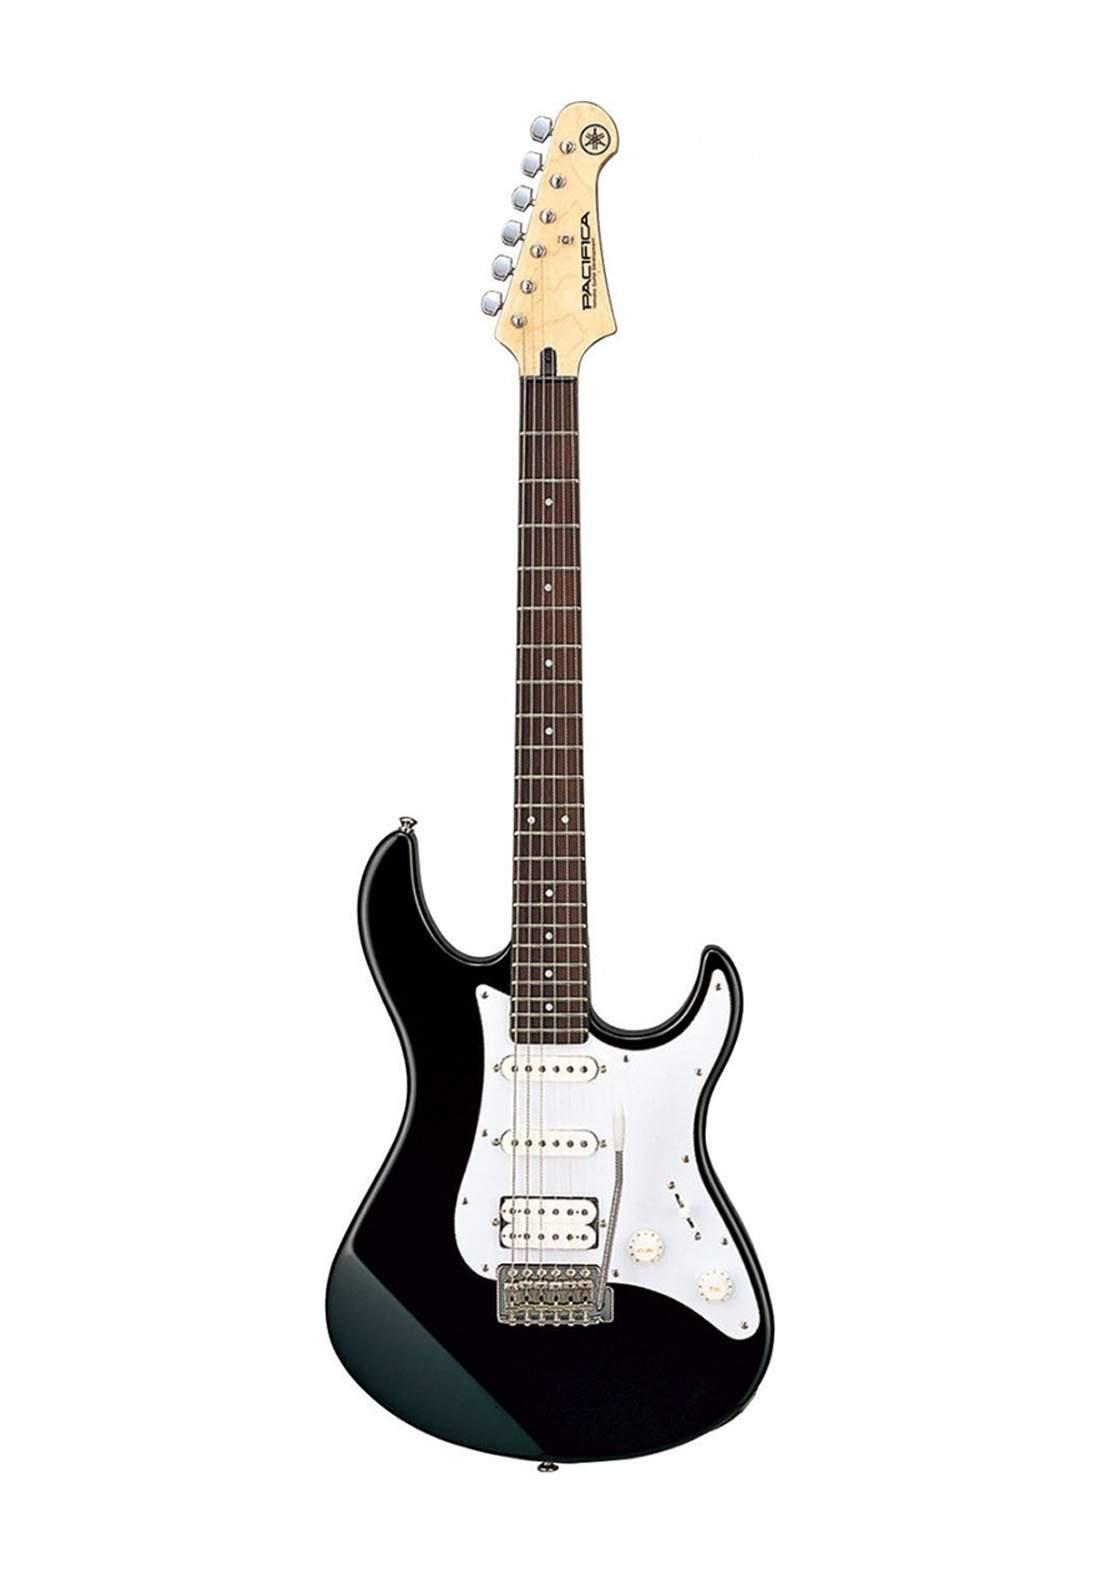 Yamaha Electric Guitar جيتار كهربائي